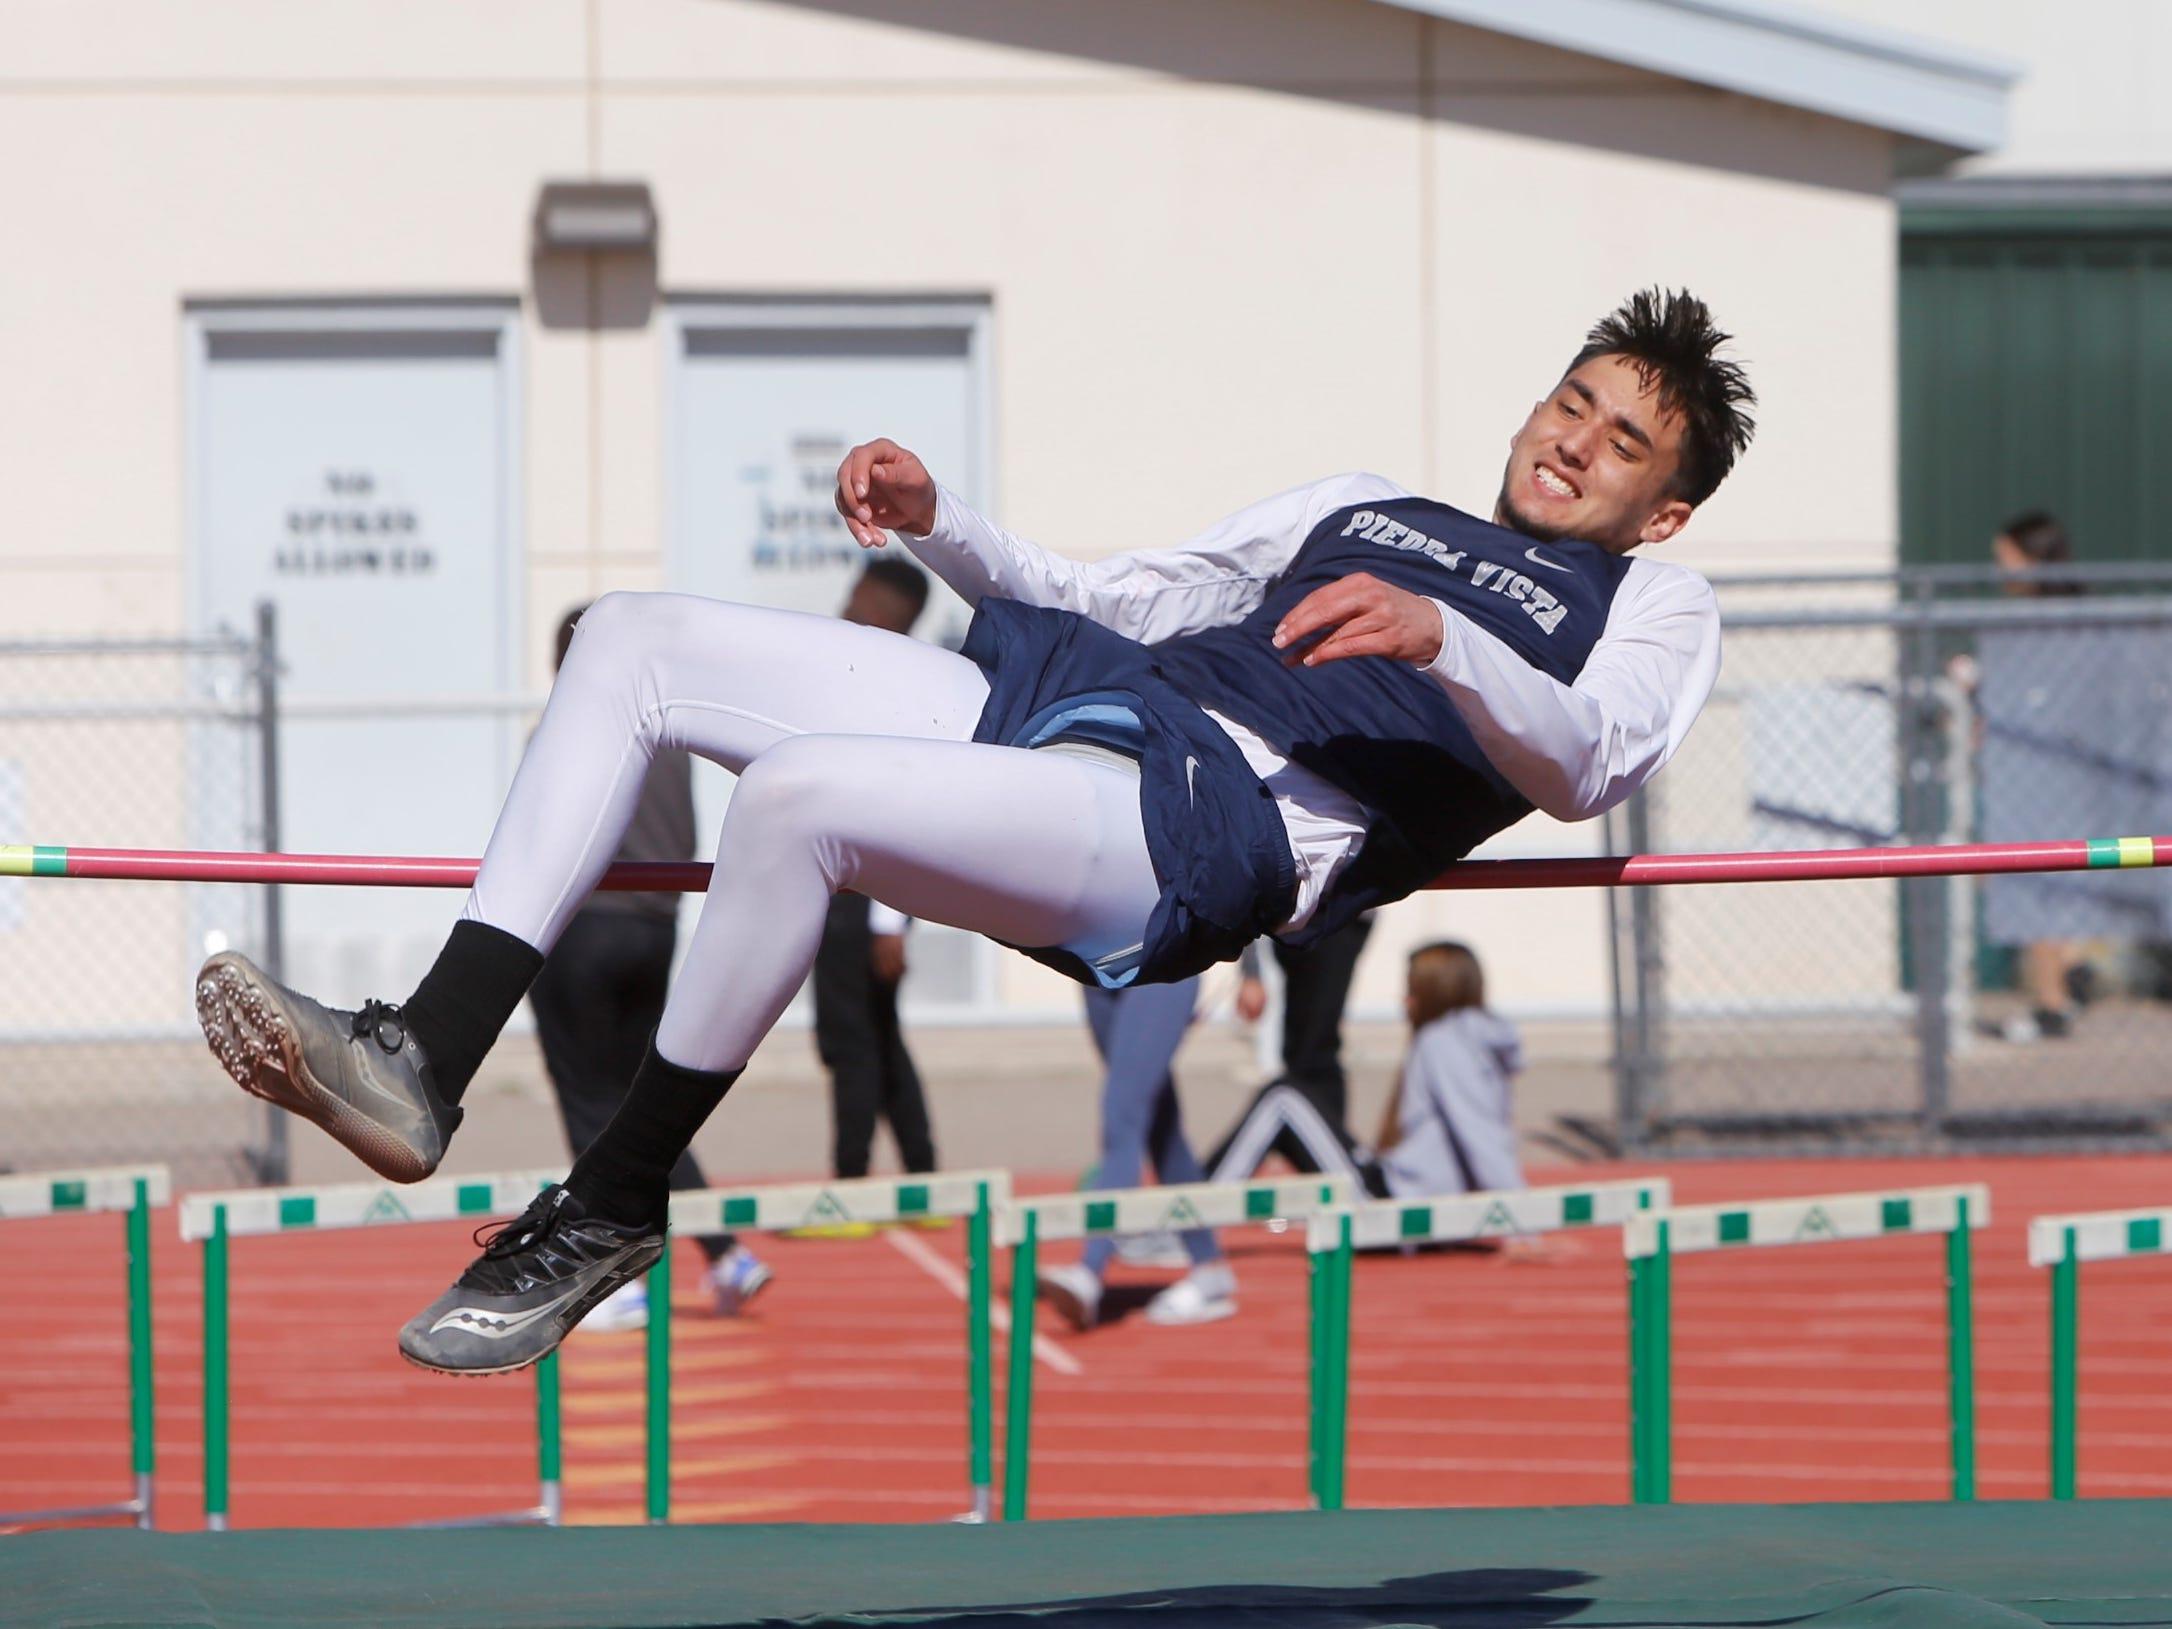 Piedra Vista's Noah Keune flies backward over the bar in the boys high jump during Saturday's Farmington Invitational at Hutchison Stadium. Keune did not place in the event.